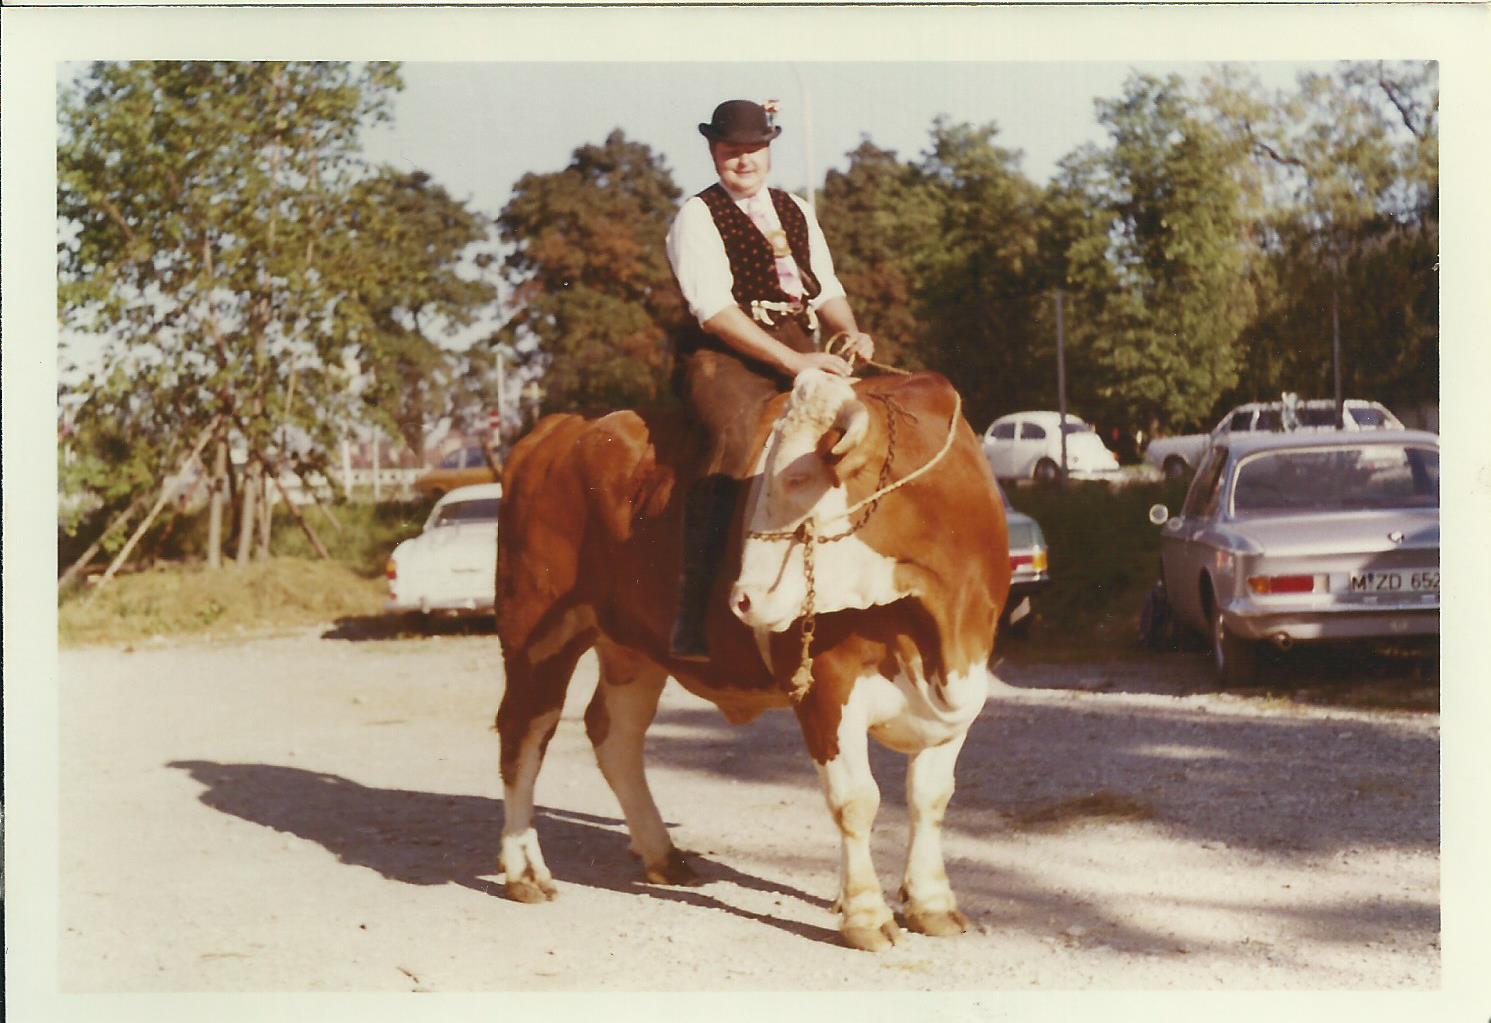 1. Münchner Ochsenrennen 1970